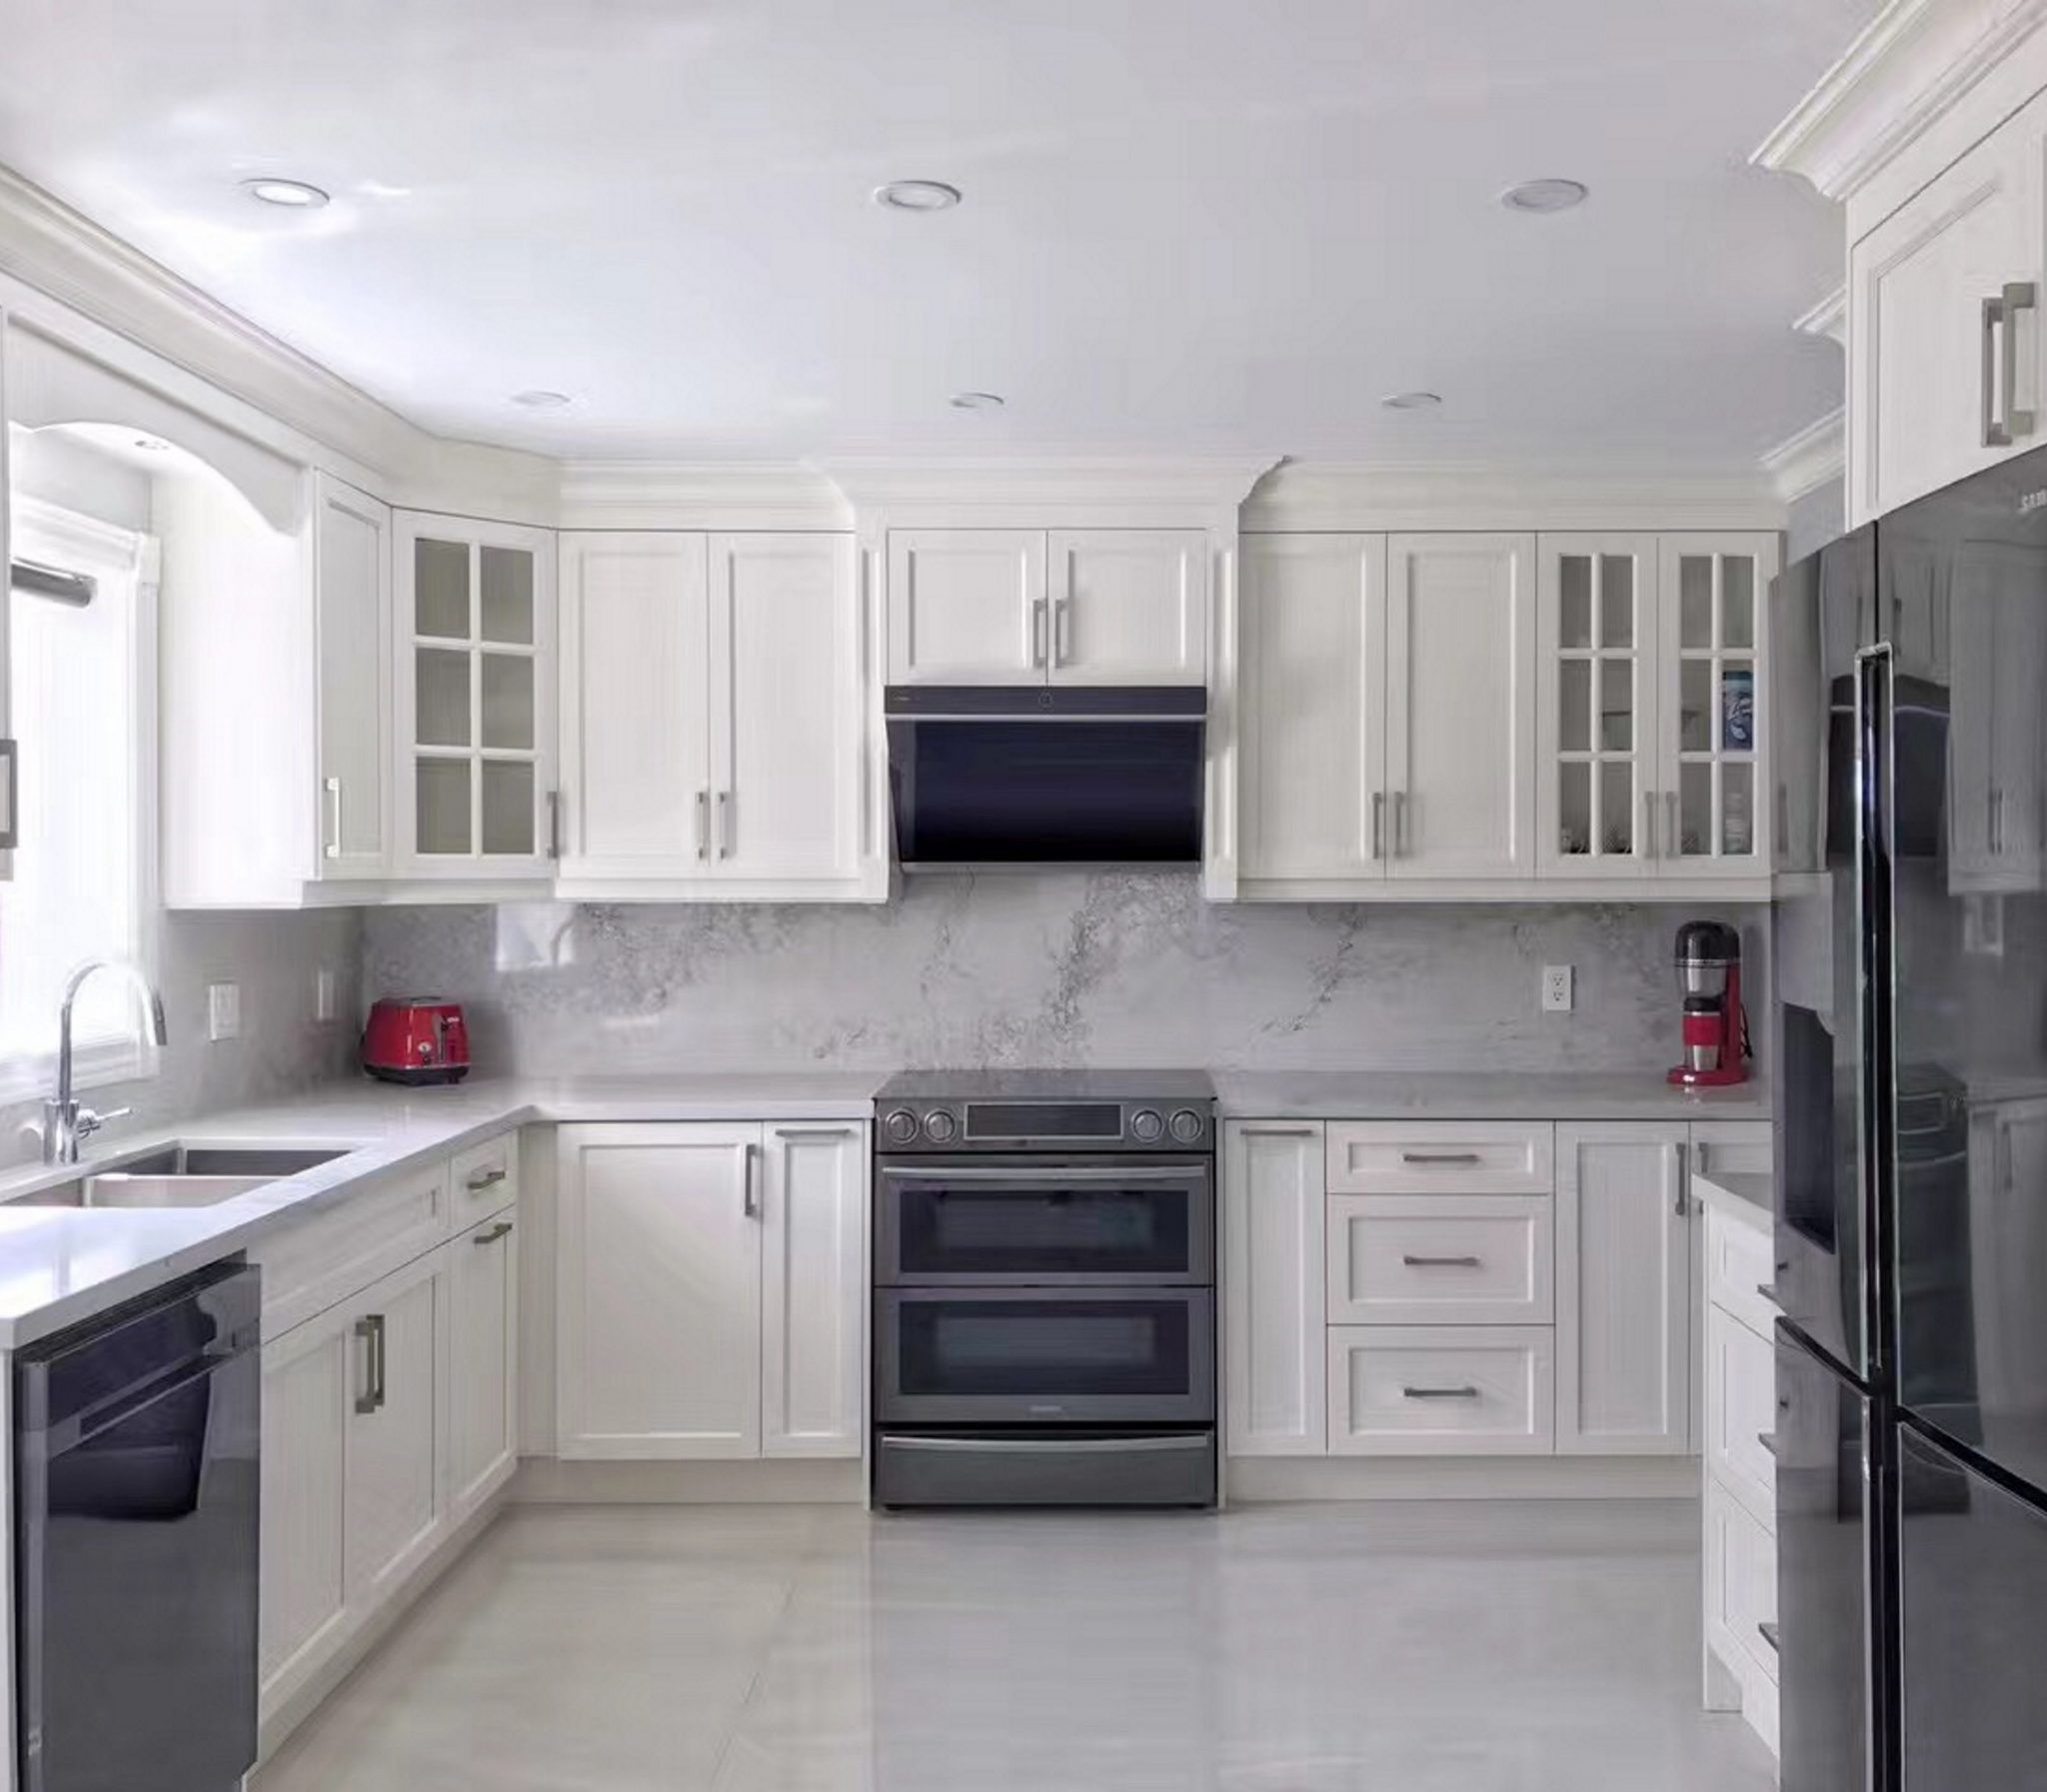 Jqg7501 Lifestyle1 Installing Cabinets Kitchen Hoods Range Hood